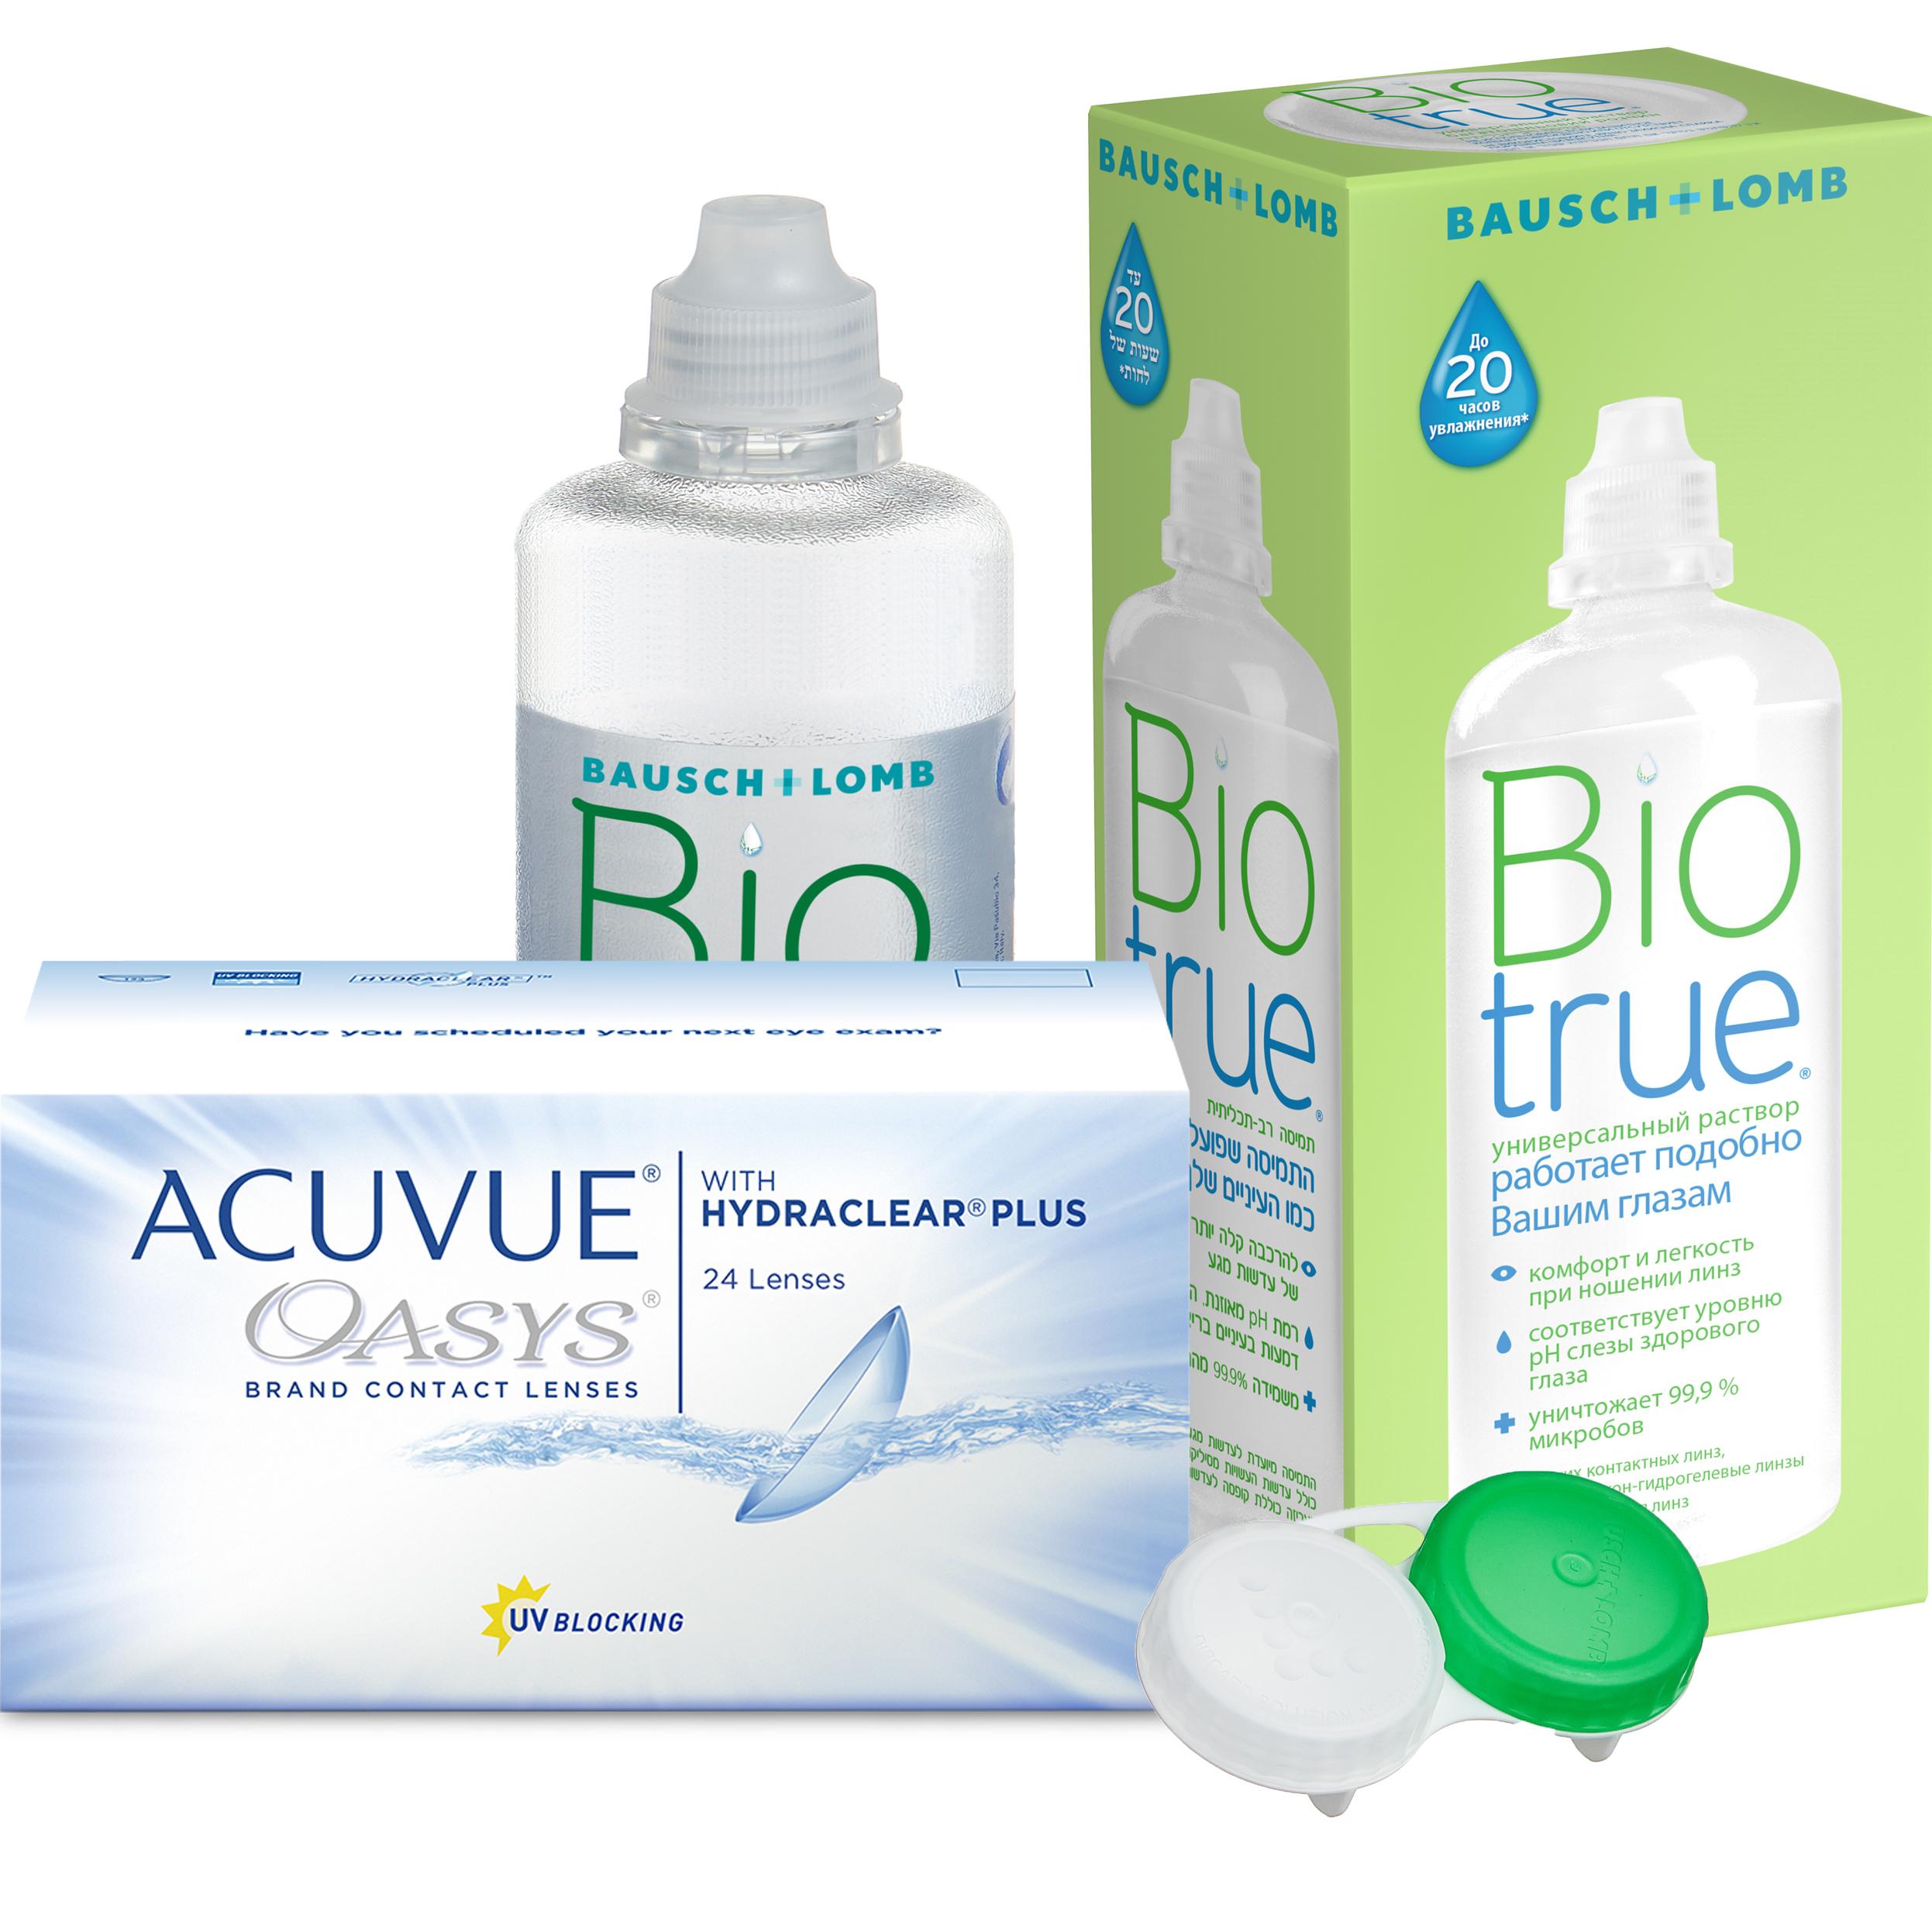 Купить Oasys with Hydraclear Plus 24 линзы + Biotrue, Контактные линзы Acuvue Oasys with Hydraclear Plus 24 линзы R 8.8 -3, 25 + Biotrue 300 мл